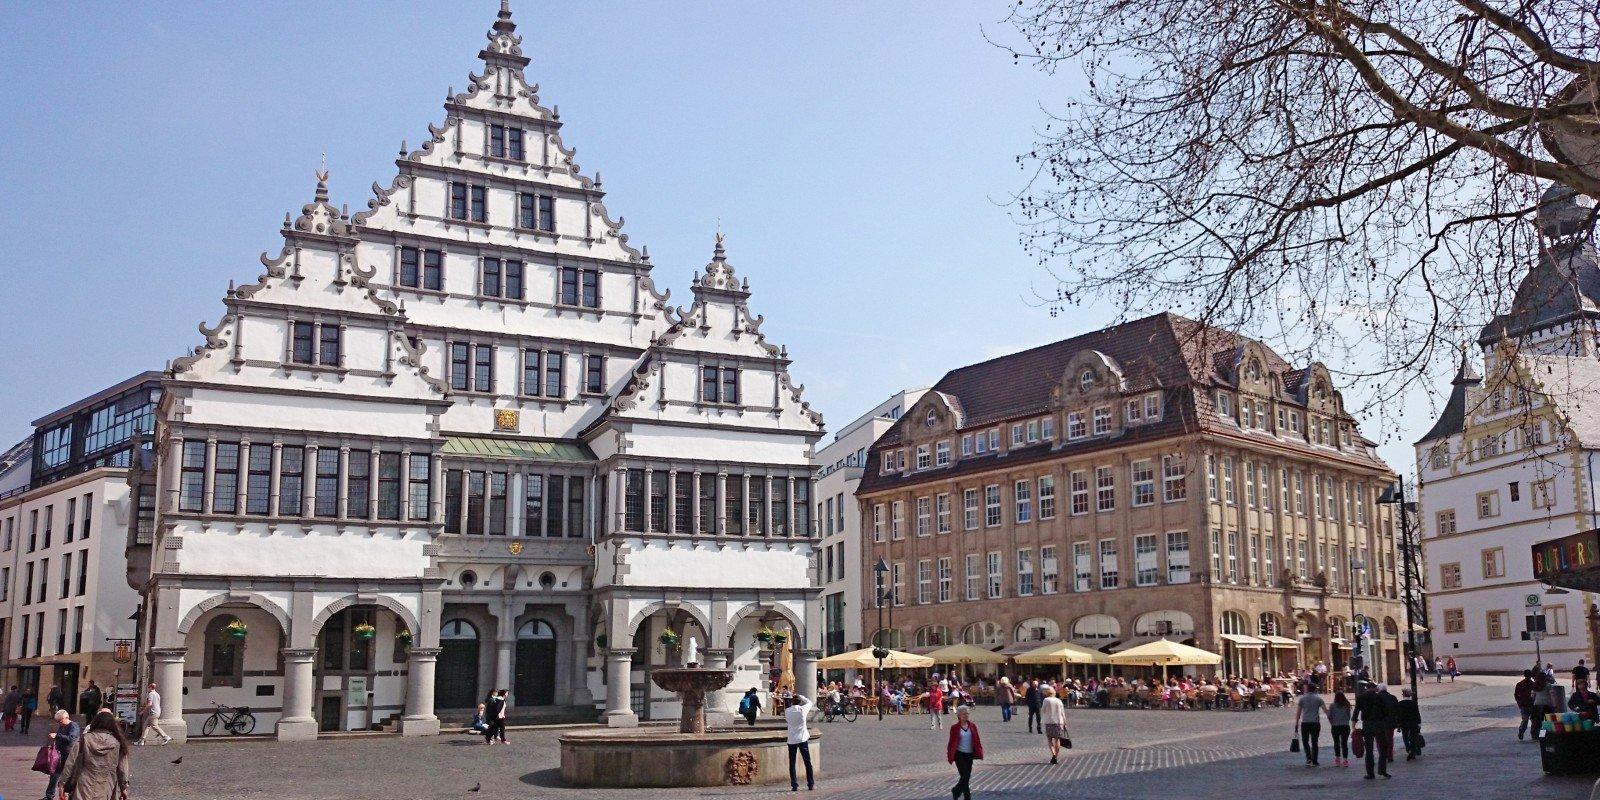 1_Rathausplatz_KS_2015.jpg